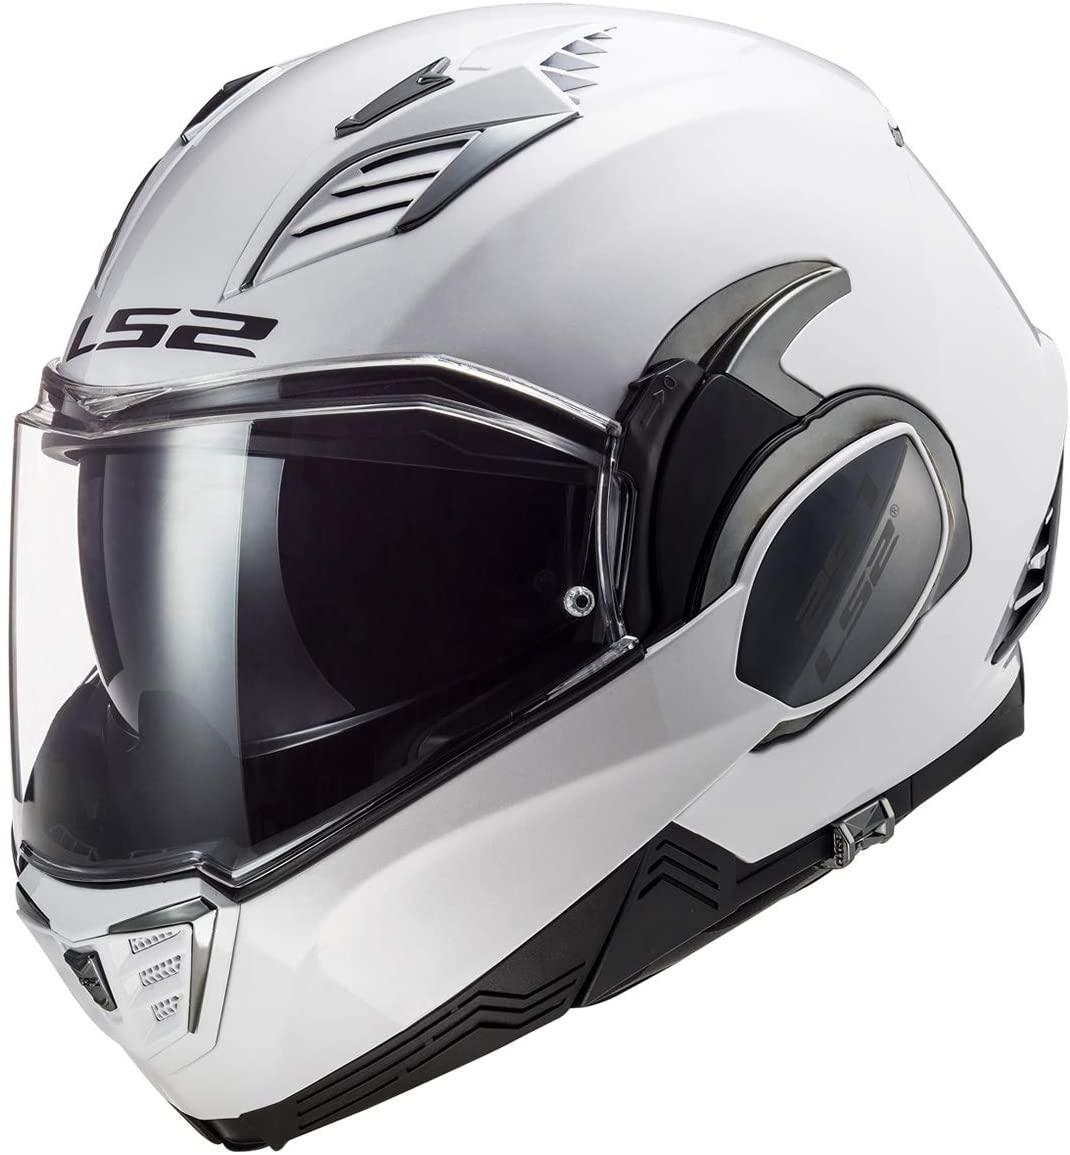 LS2 Helmets Valiant II Modular Helmet (Gloss White - Large)